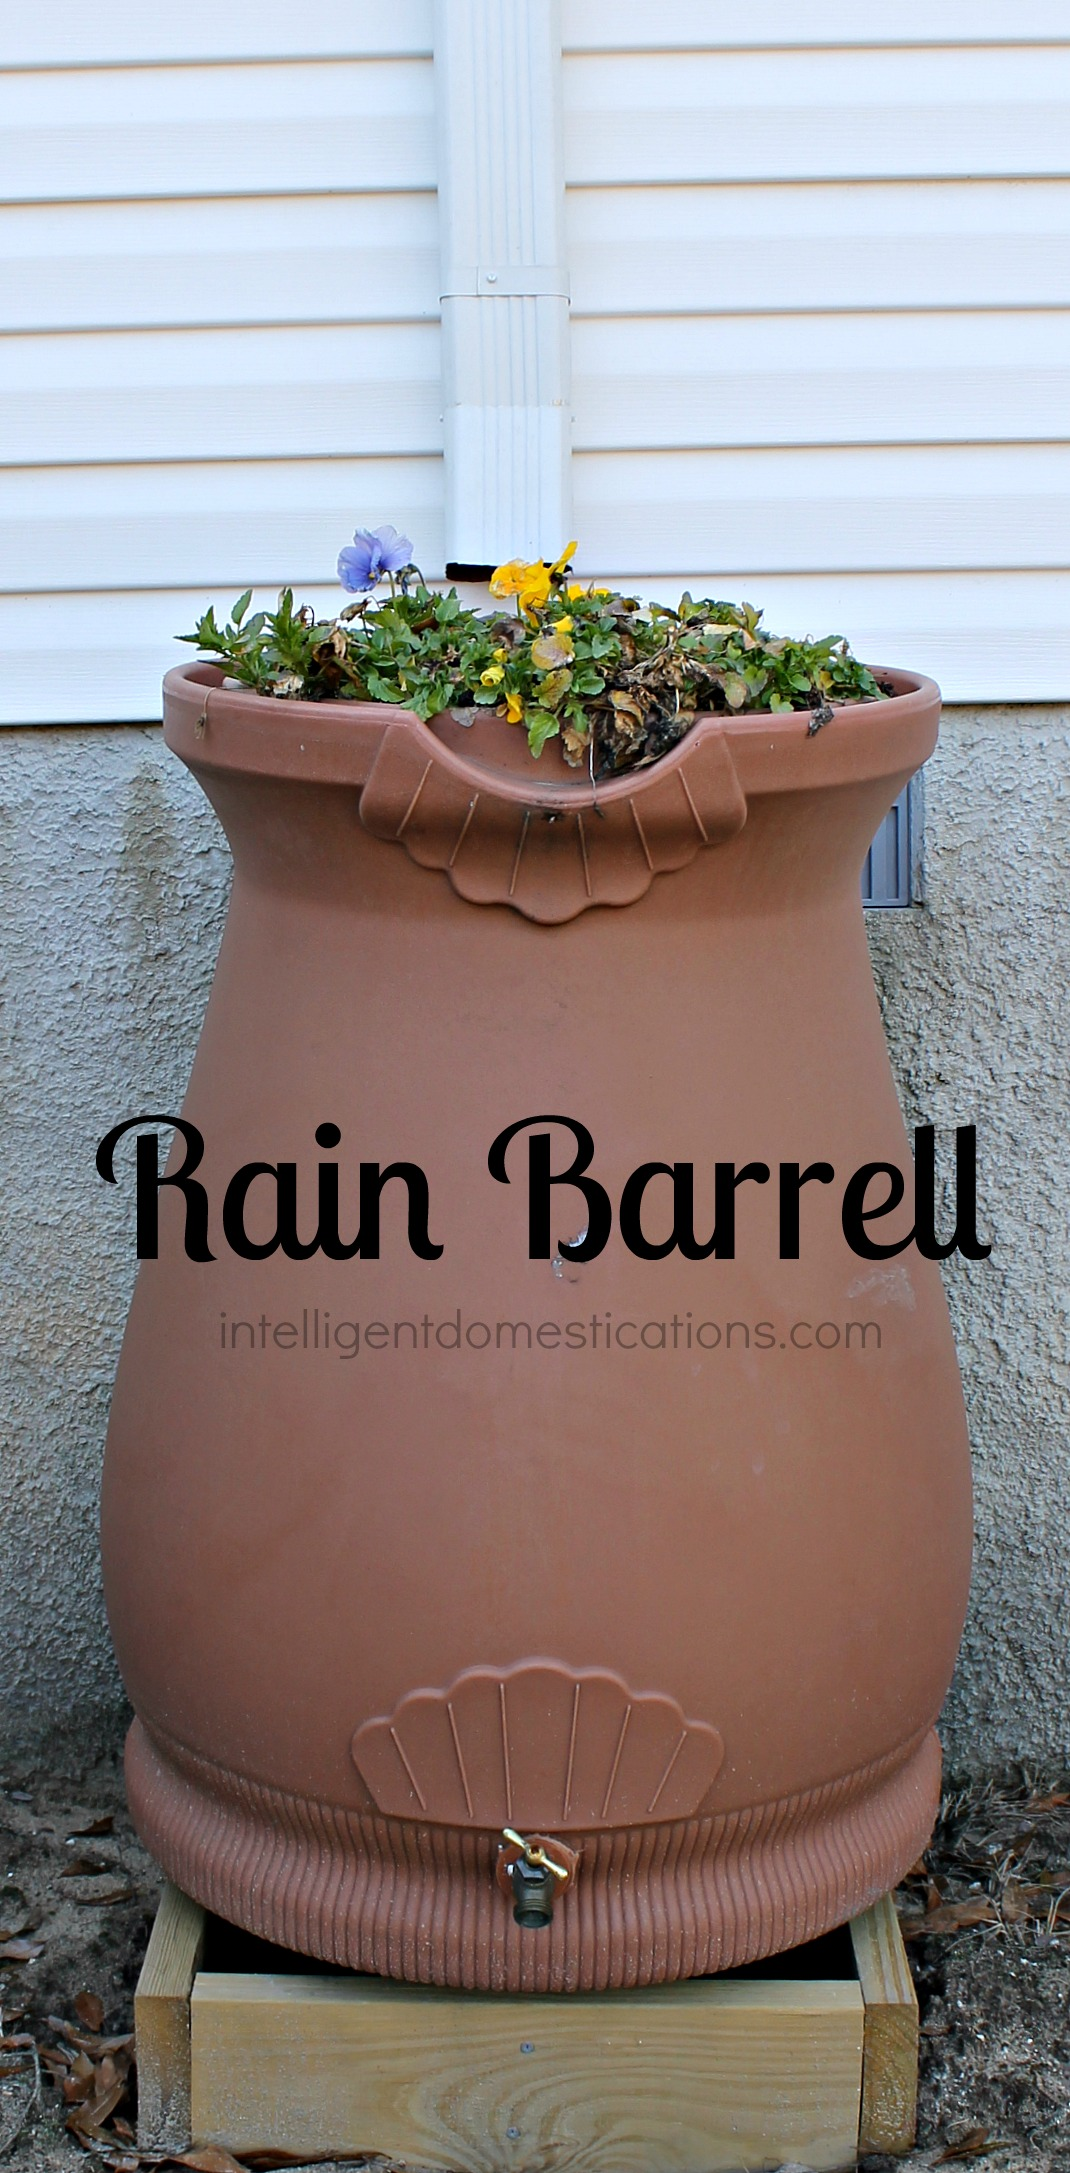 Rain Barrell installed.intelligentdomestications.com